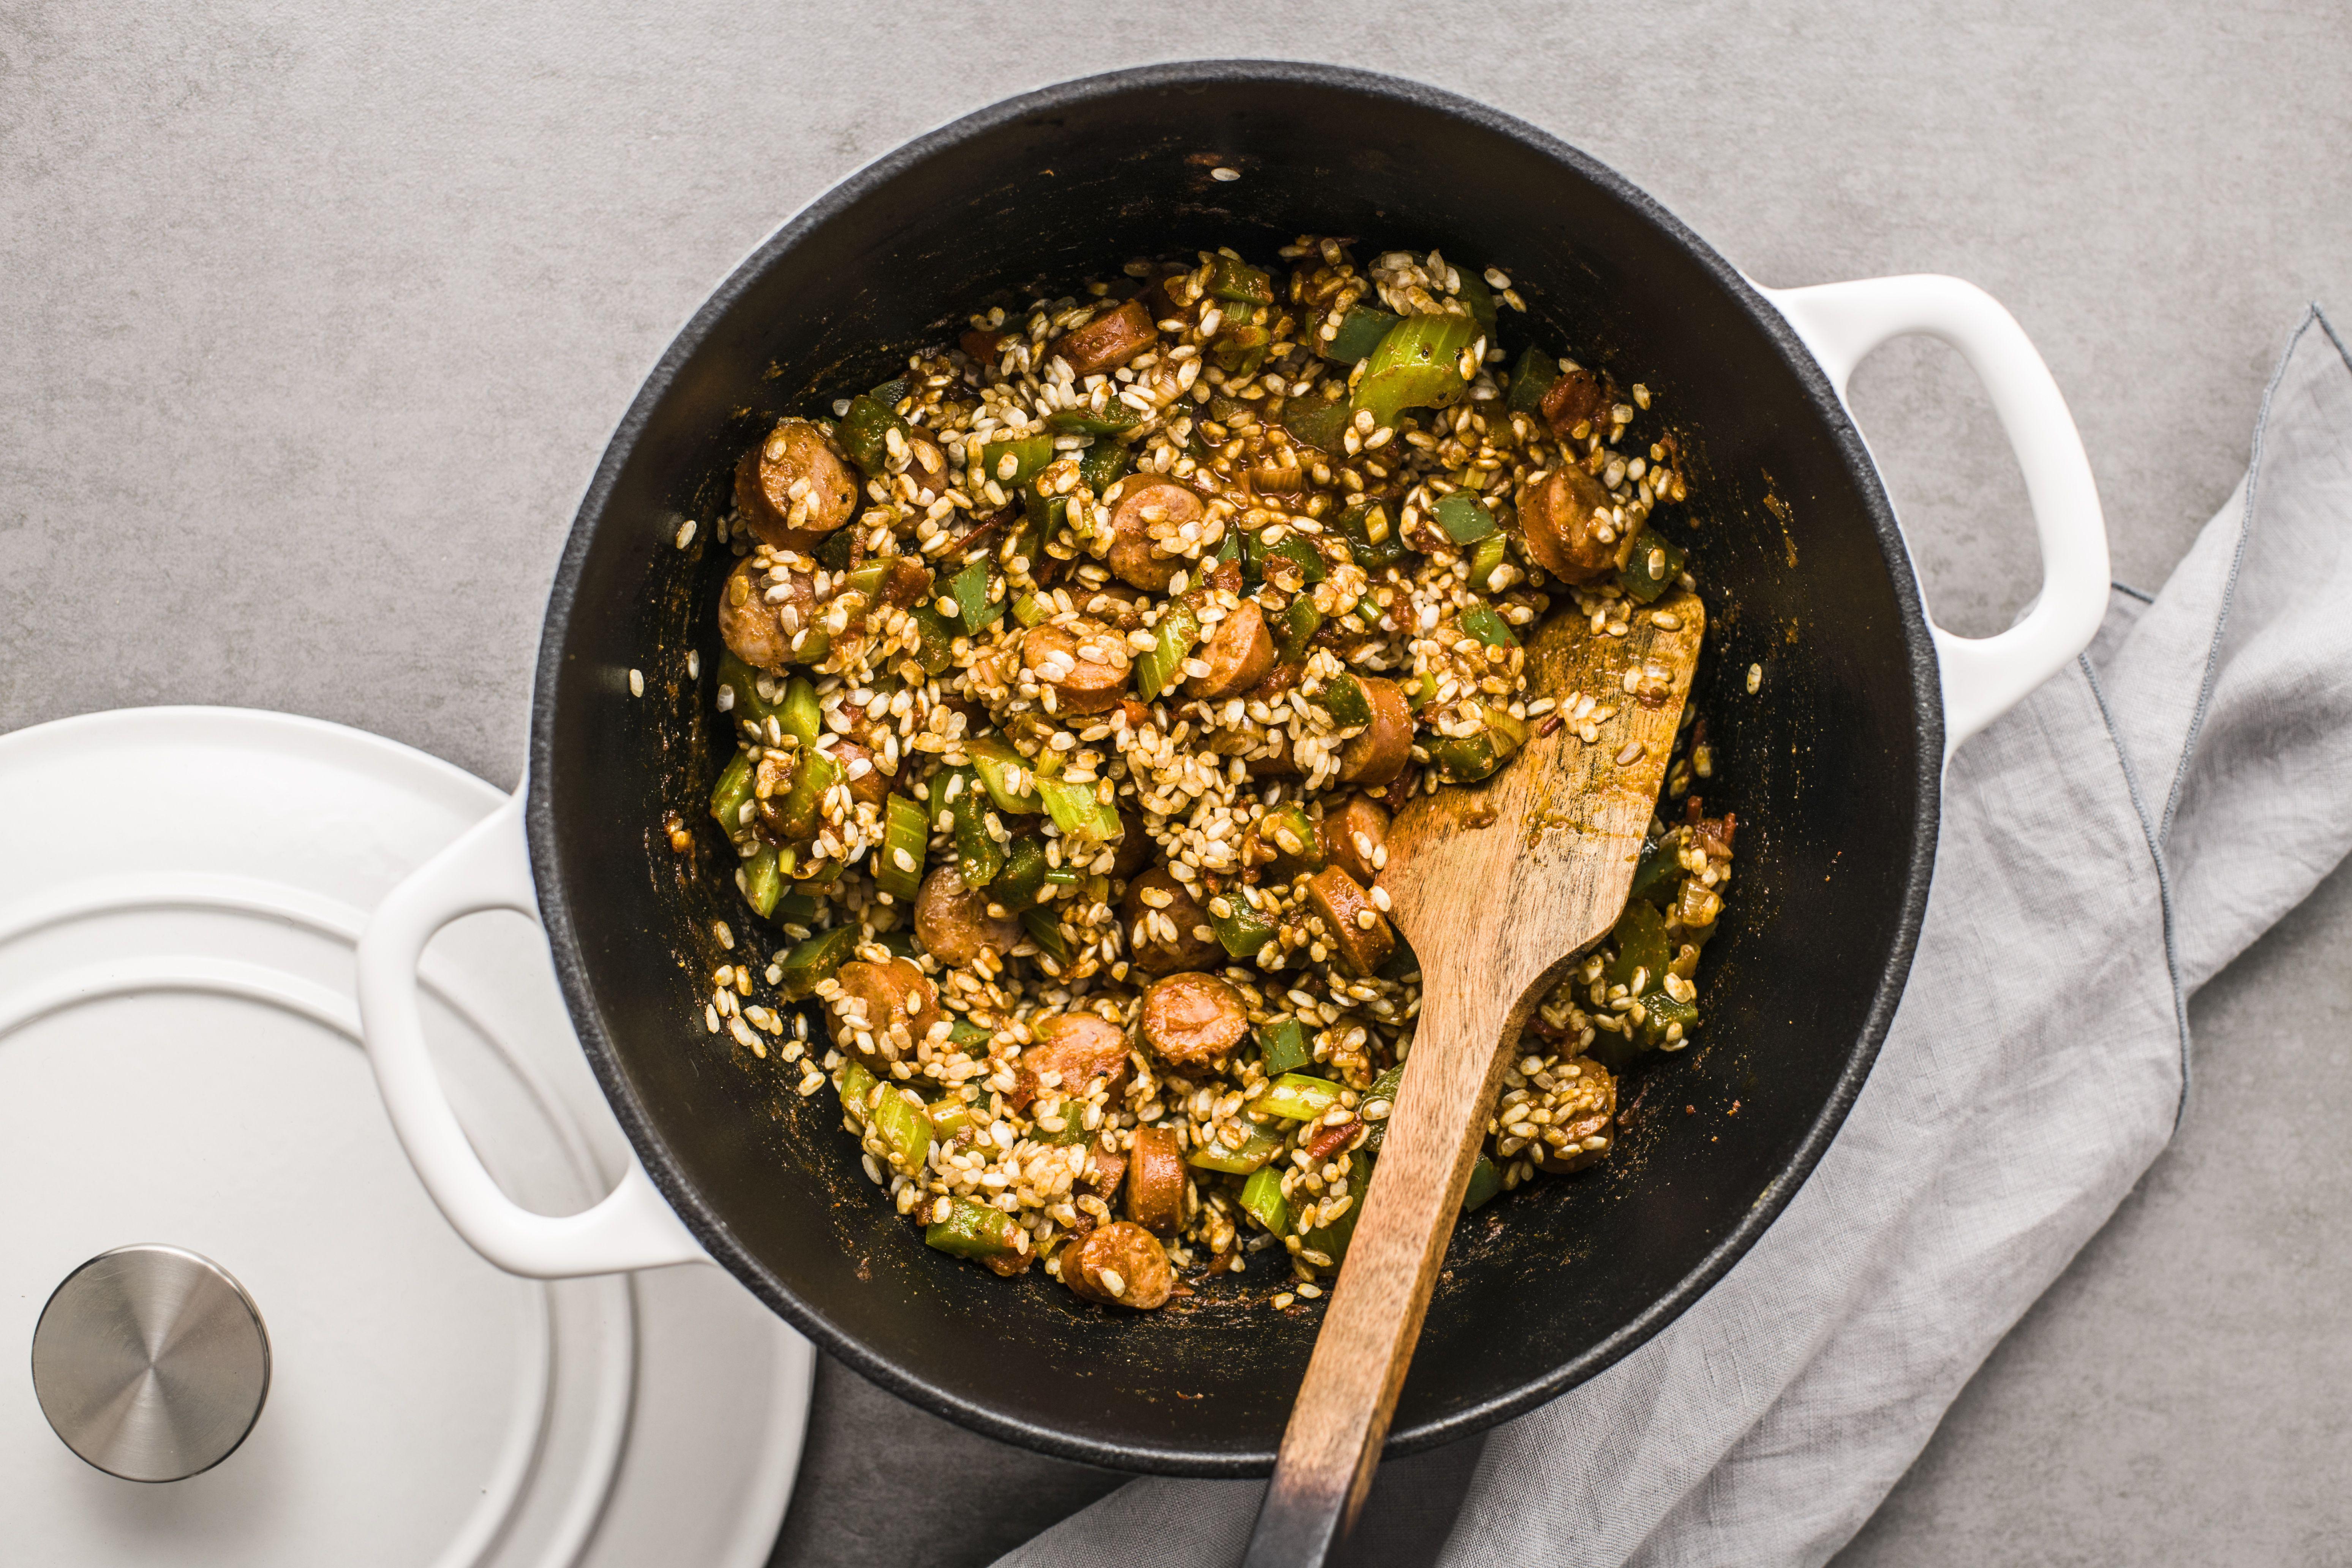 Stir in brown rice